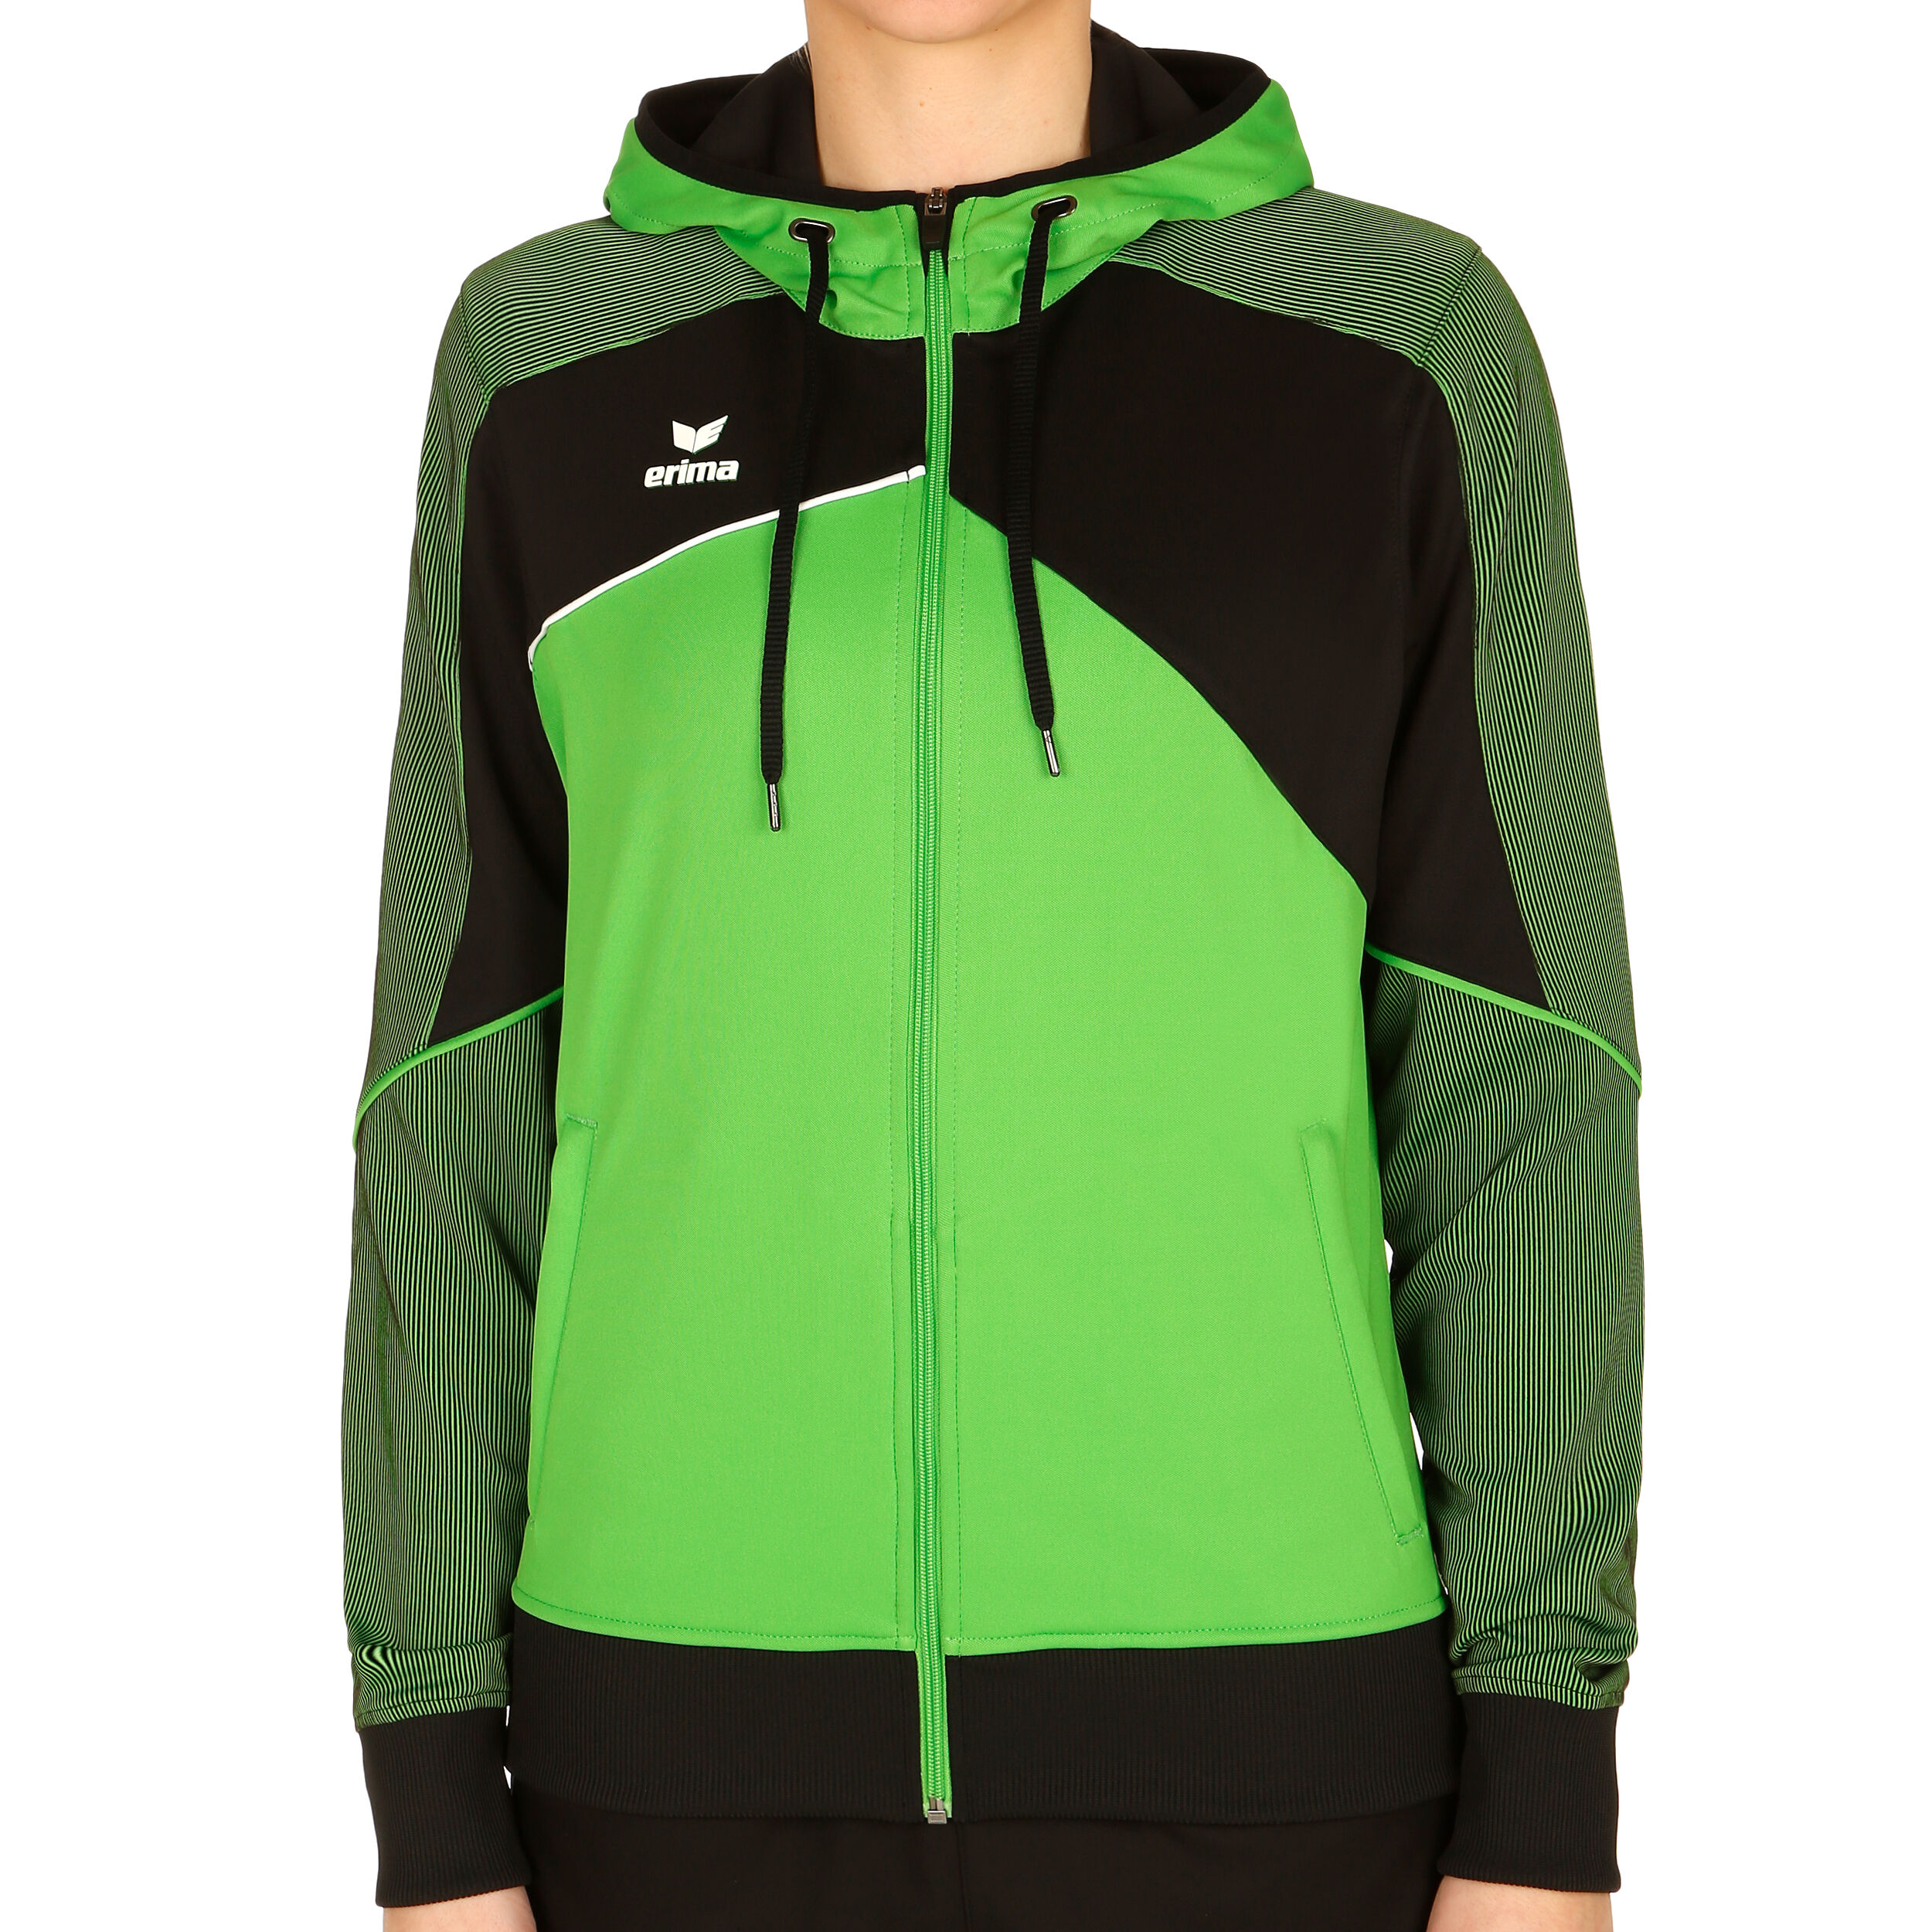 Erima Premium One 2.0 Trainingsjacke Damen Hellgrün